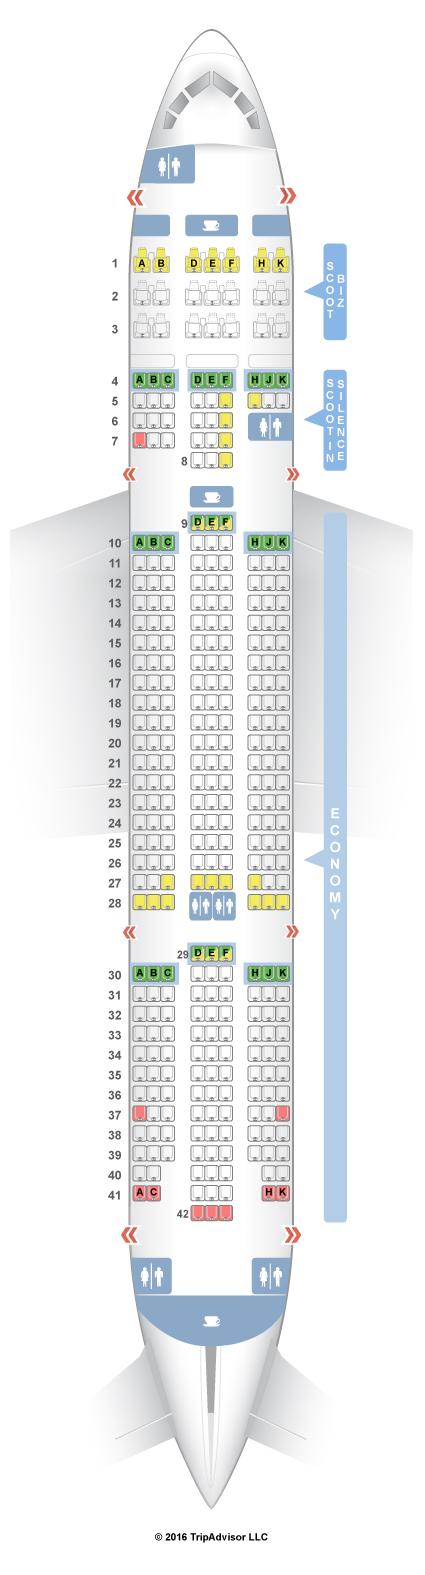 SeatGuru Seat Map Scoot Airlines